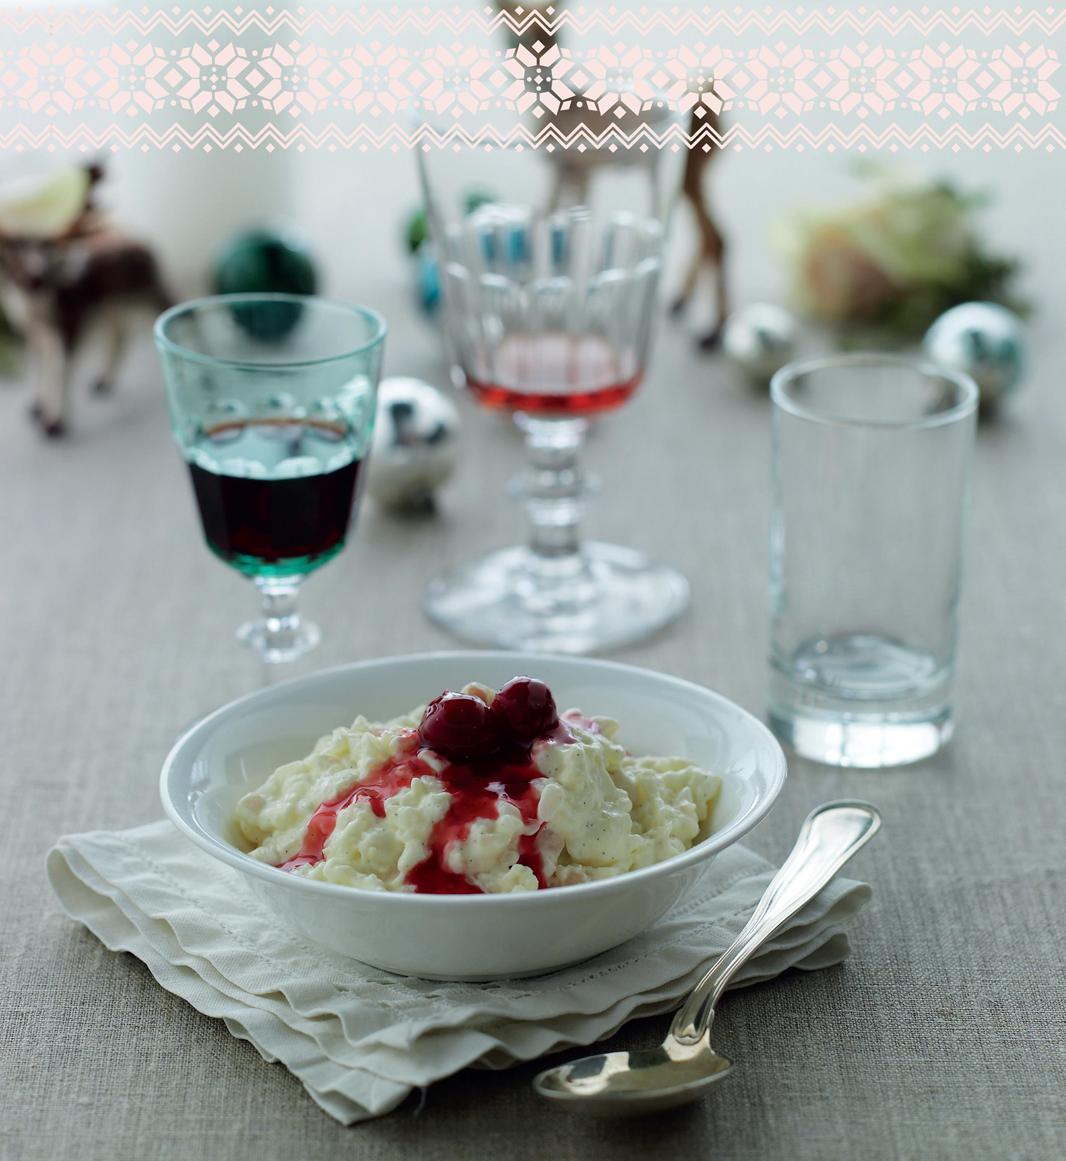 Rice pudding with hot cherry sauce | Recipe | Cherry sauce ...